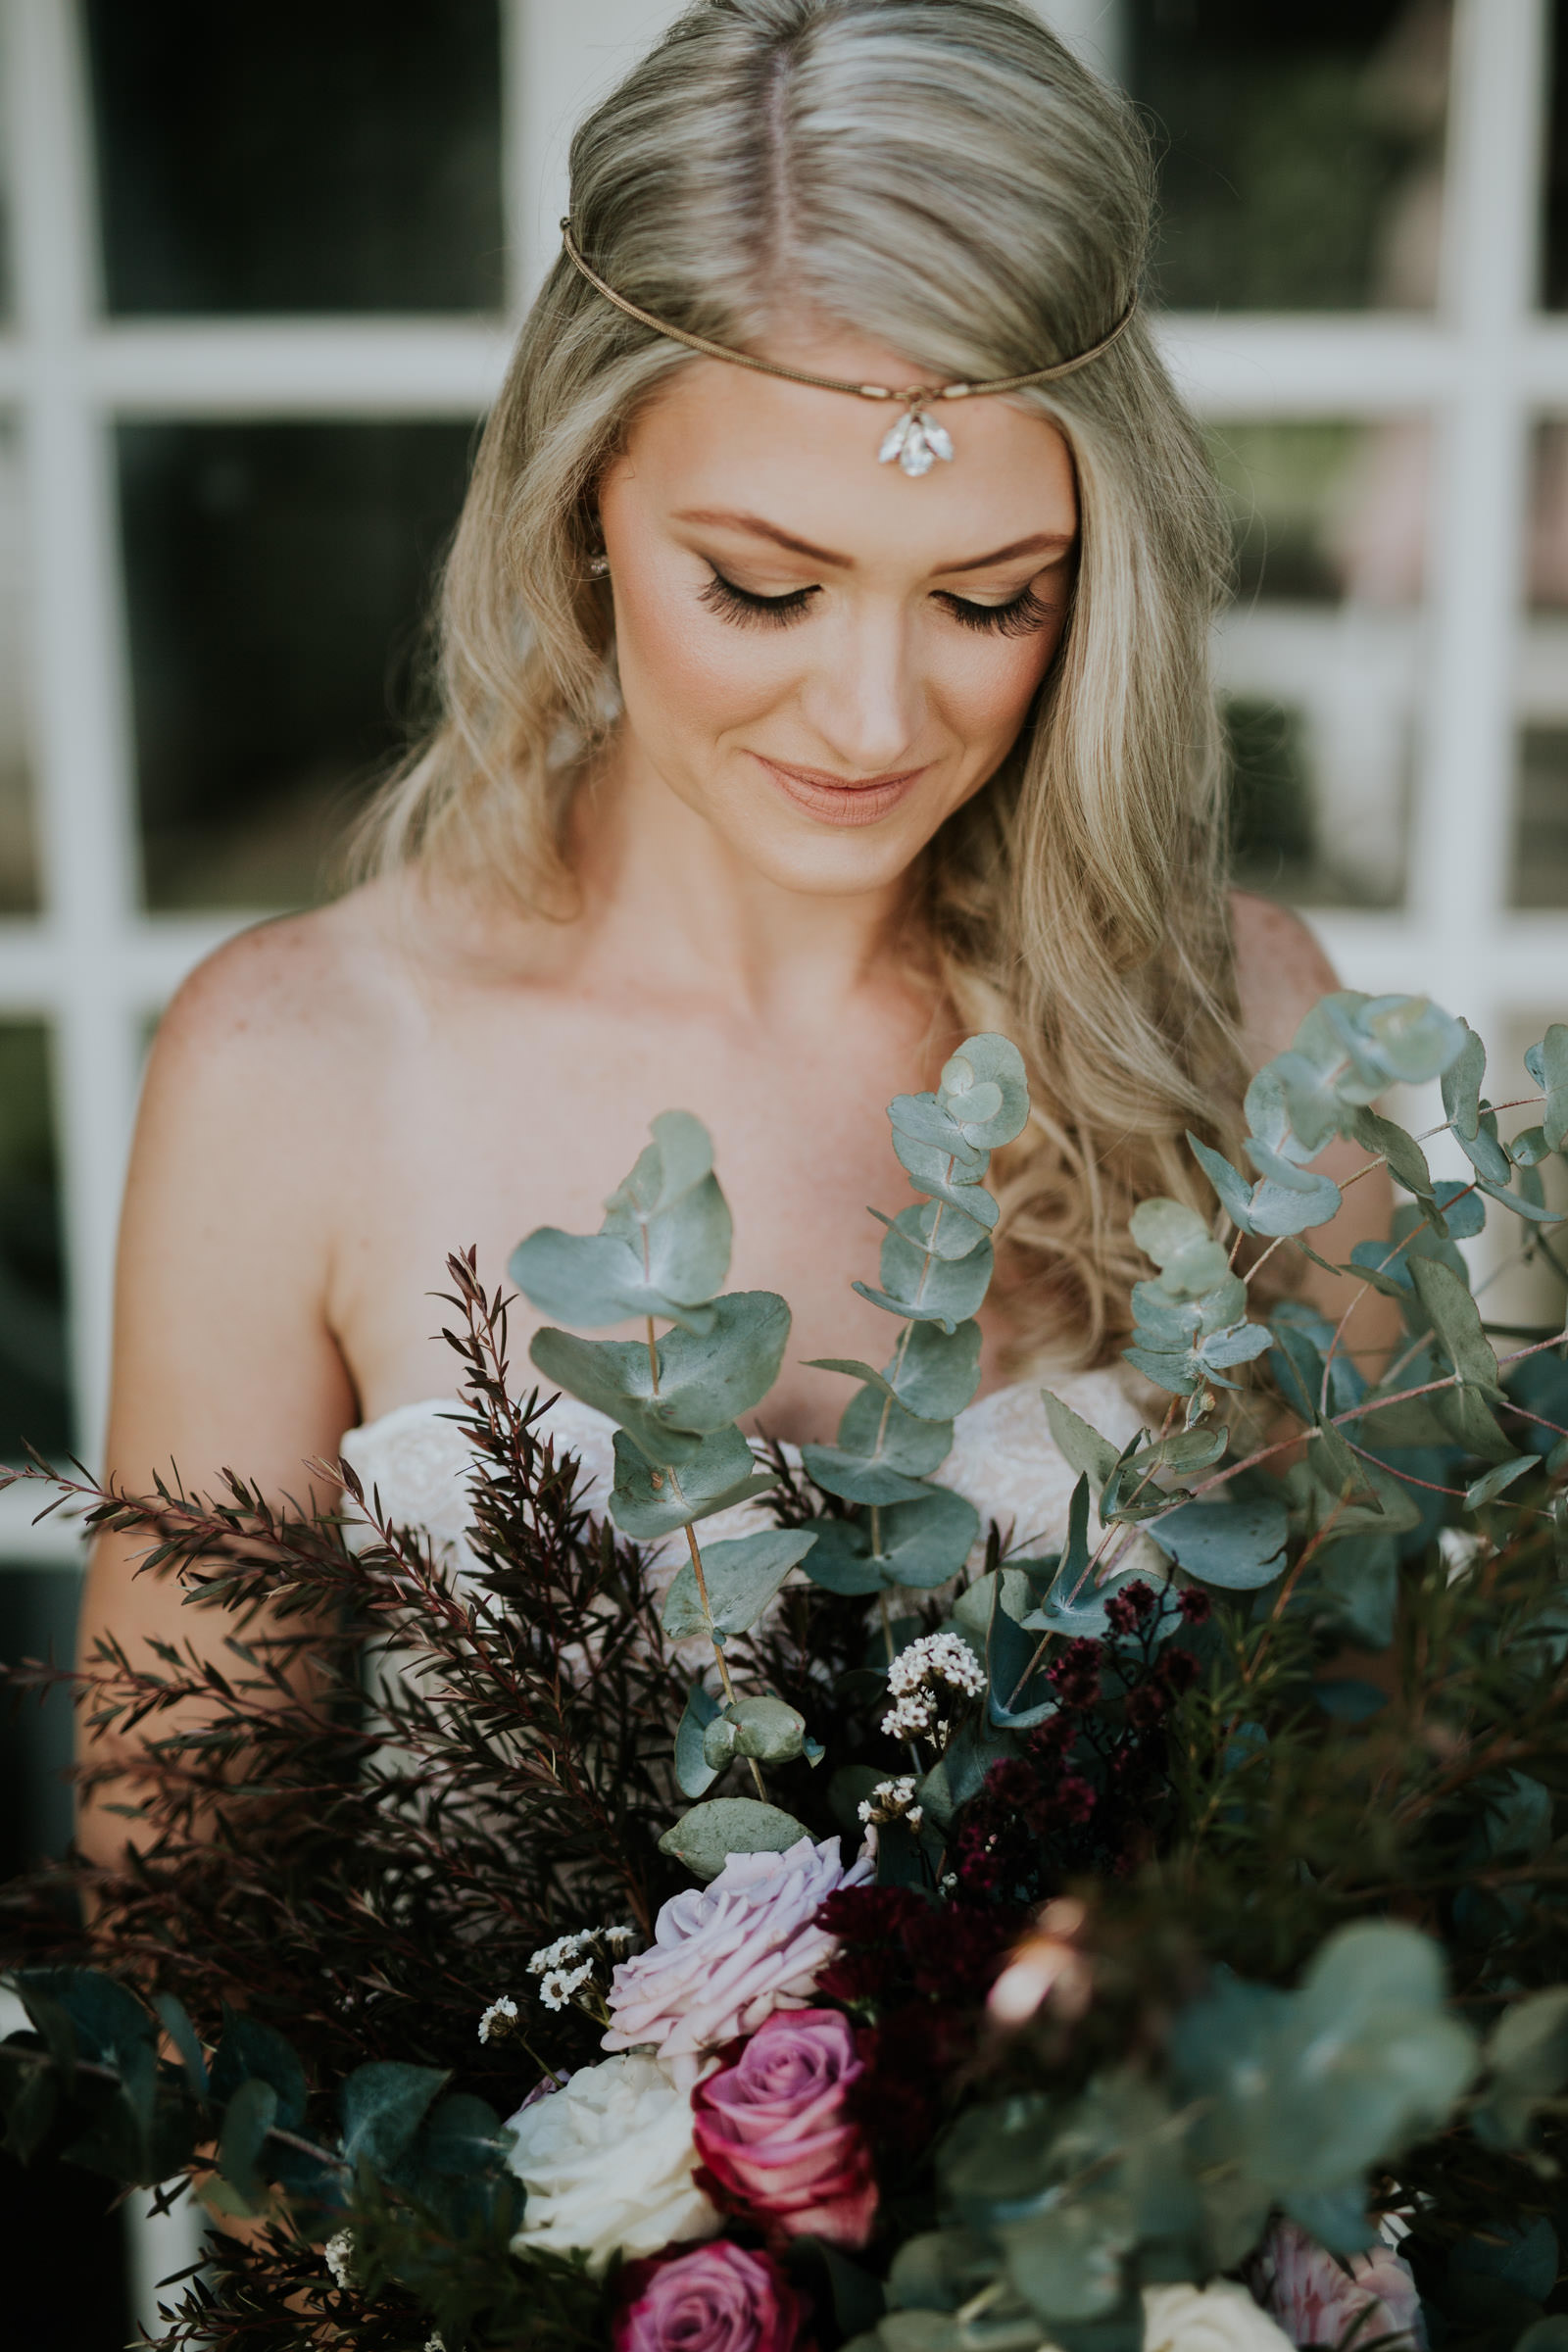 Emma+John+Far+South+Coast+Wedding+Festivl+Glamping+Bush-64.jpg